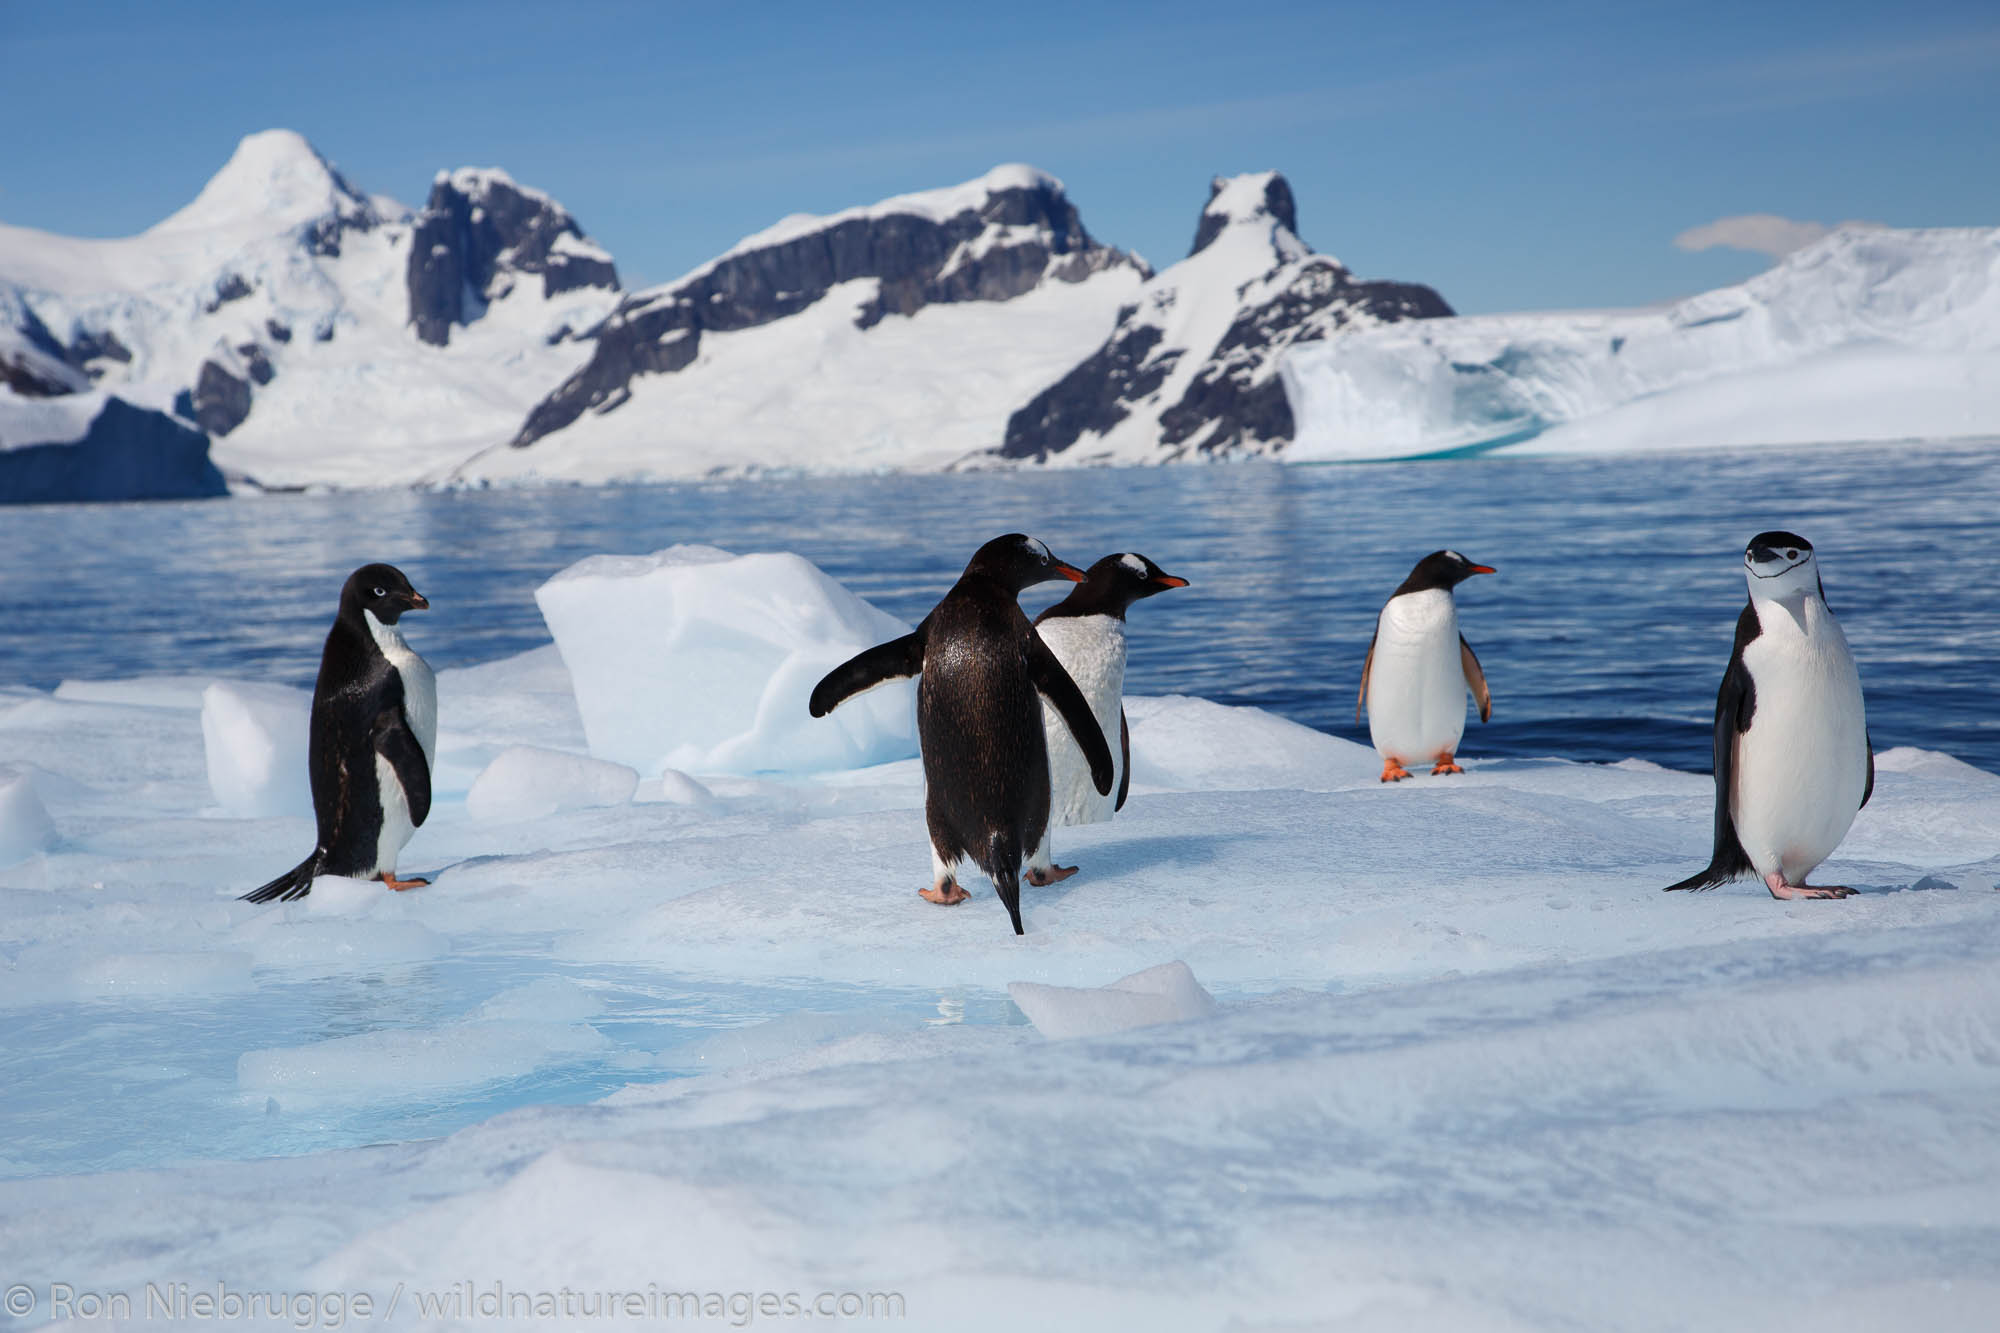 All three species of Brush-Tailed Penguins, Adélie Penguin (Pygoscelis adeliae), Chinstrap Penguin (Pygoscelis antarctica) Gentoo...